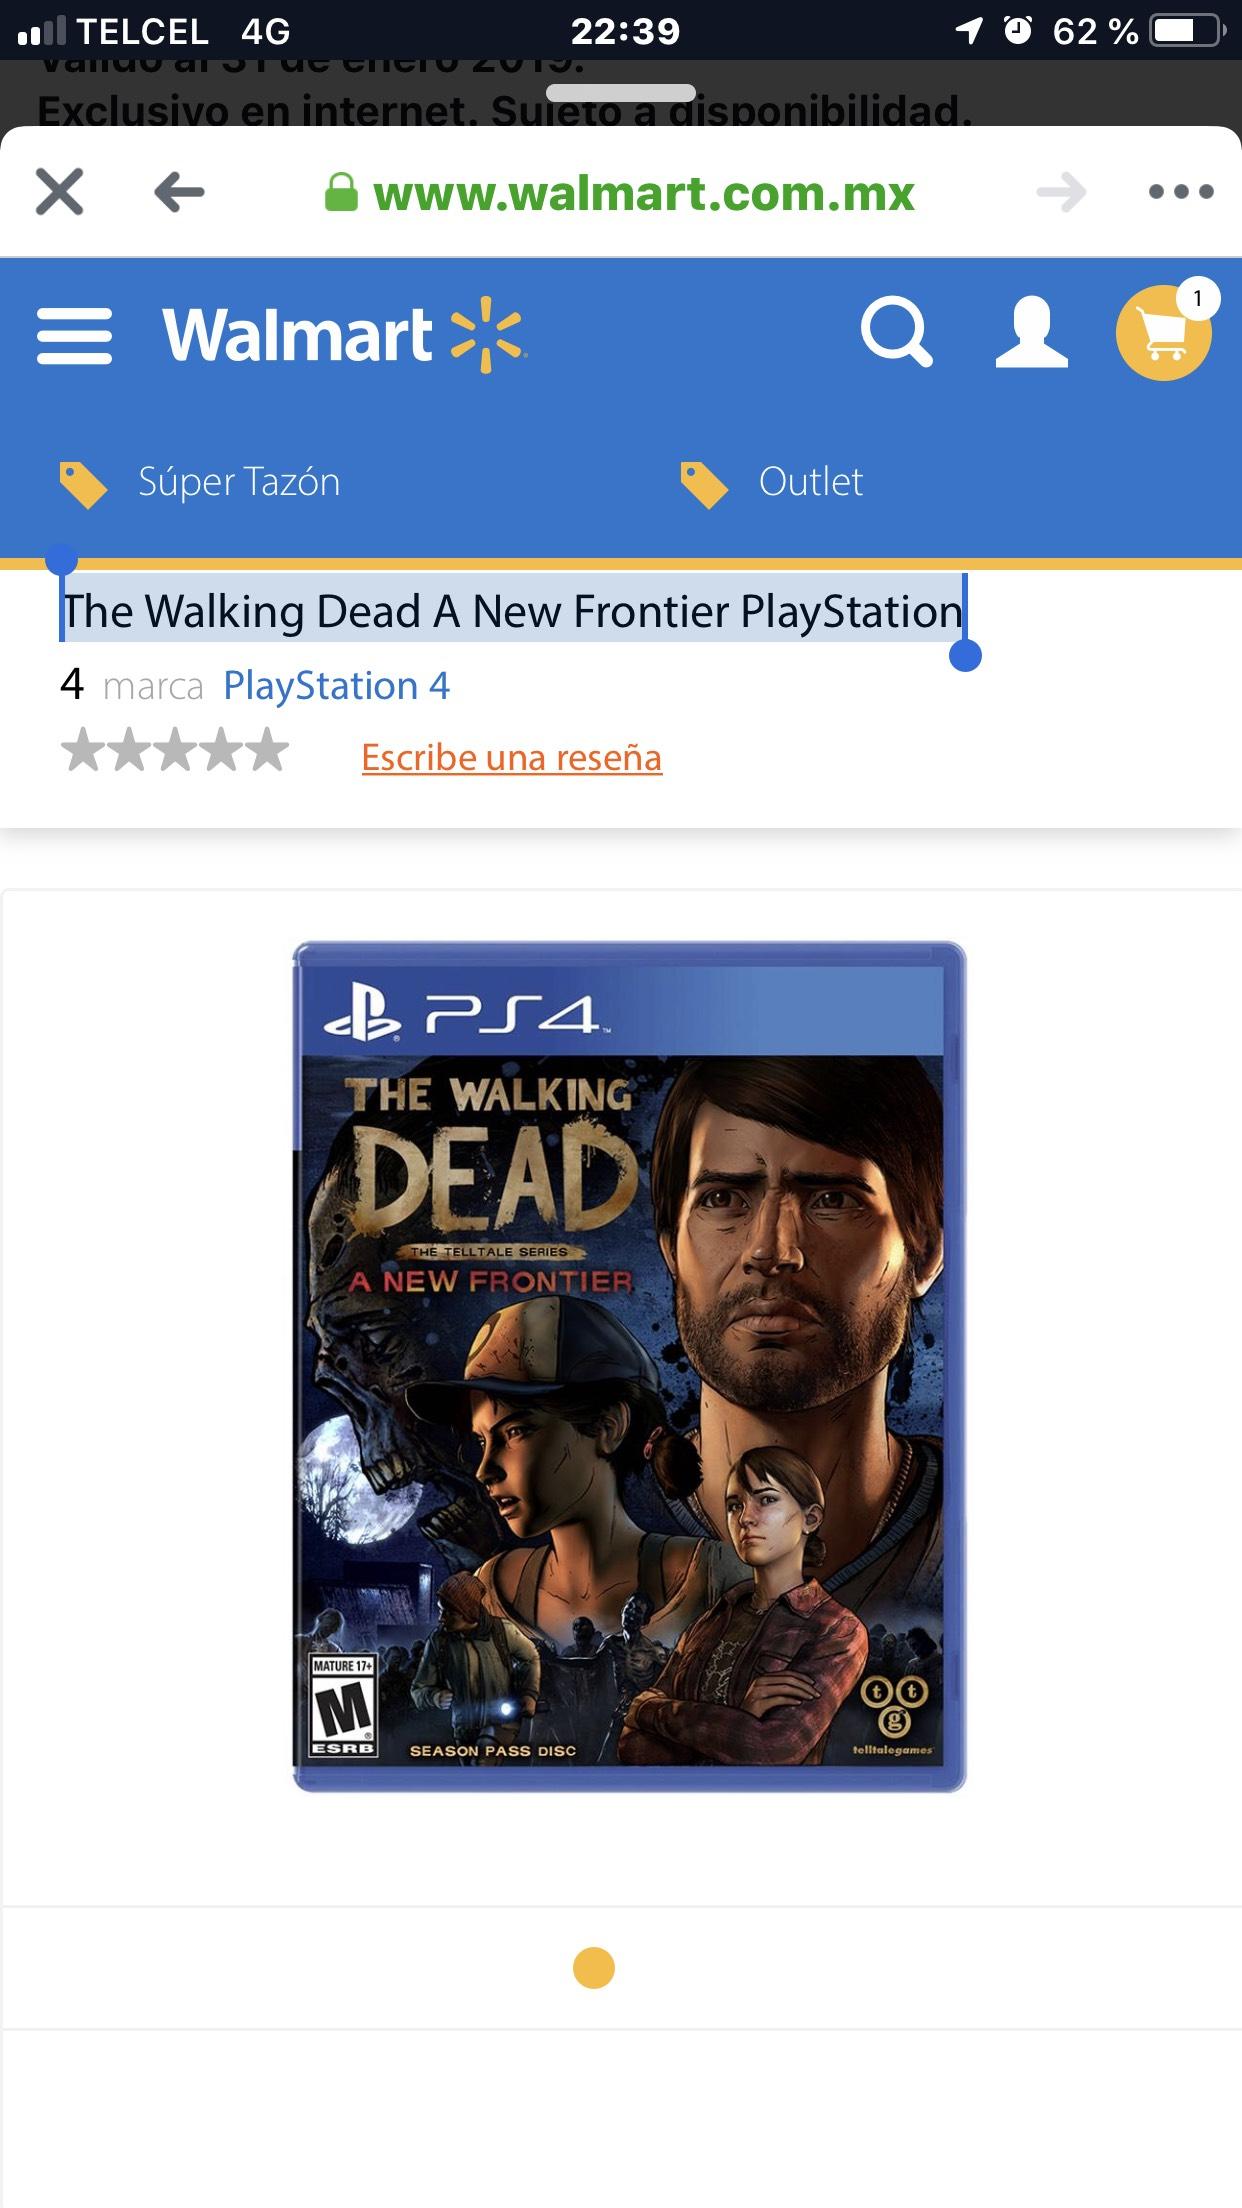 The Walking Dead PlayStation 4